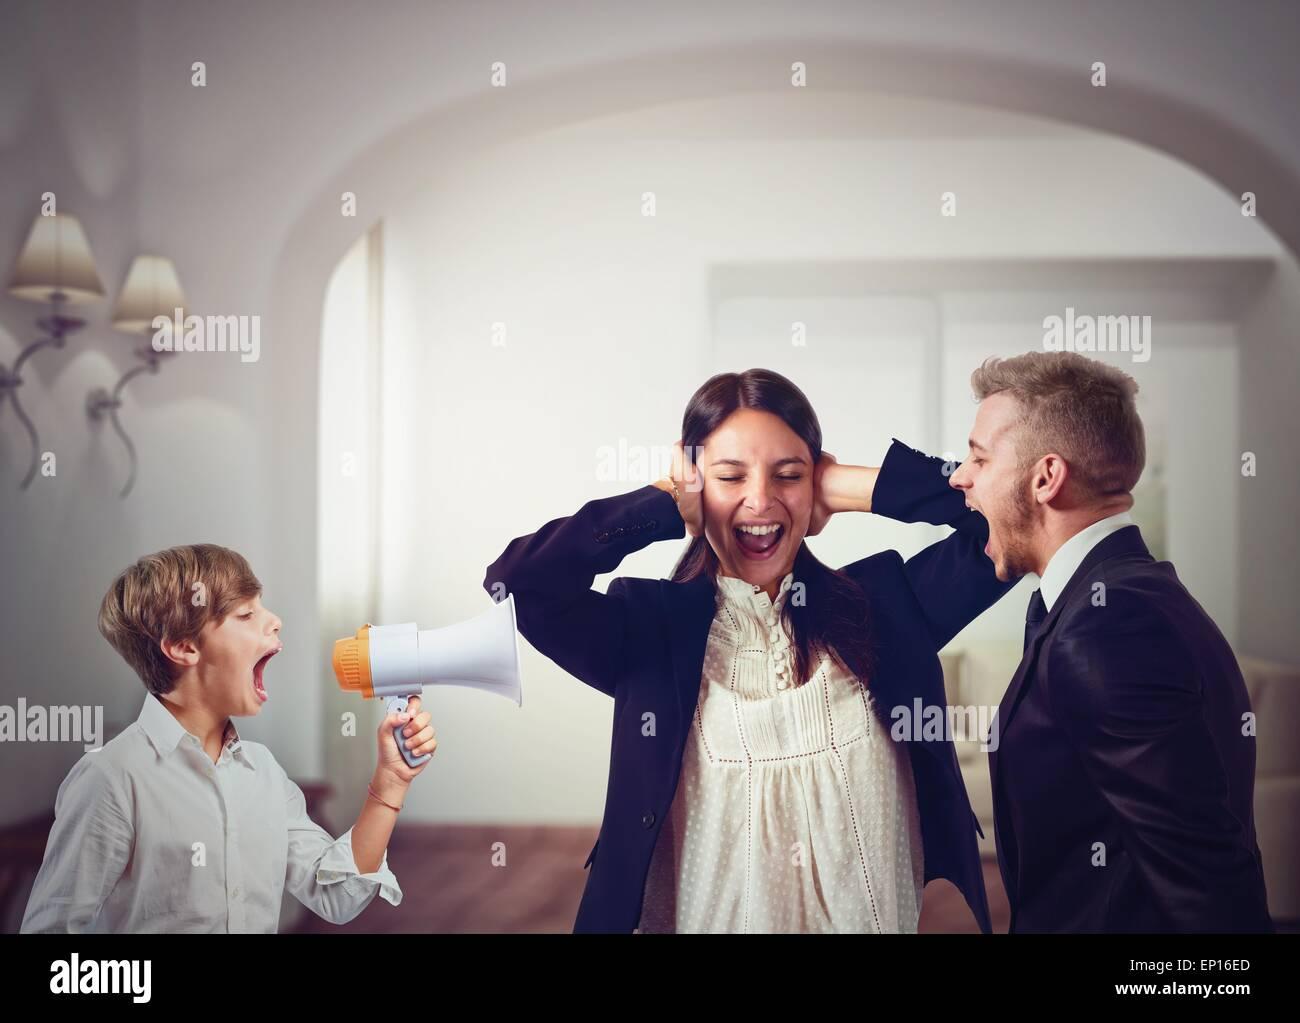 Family quarrels - Stock Image